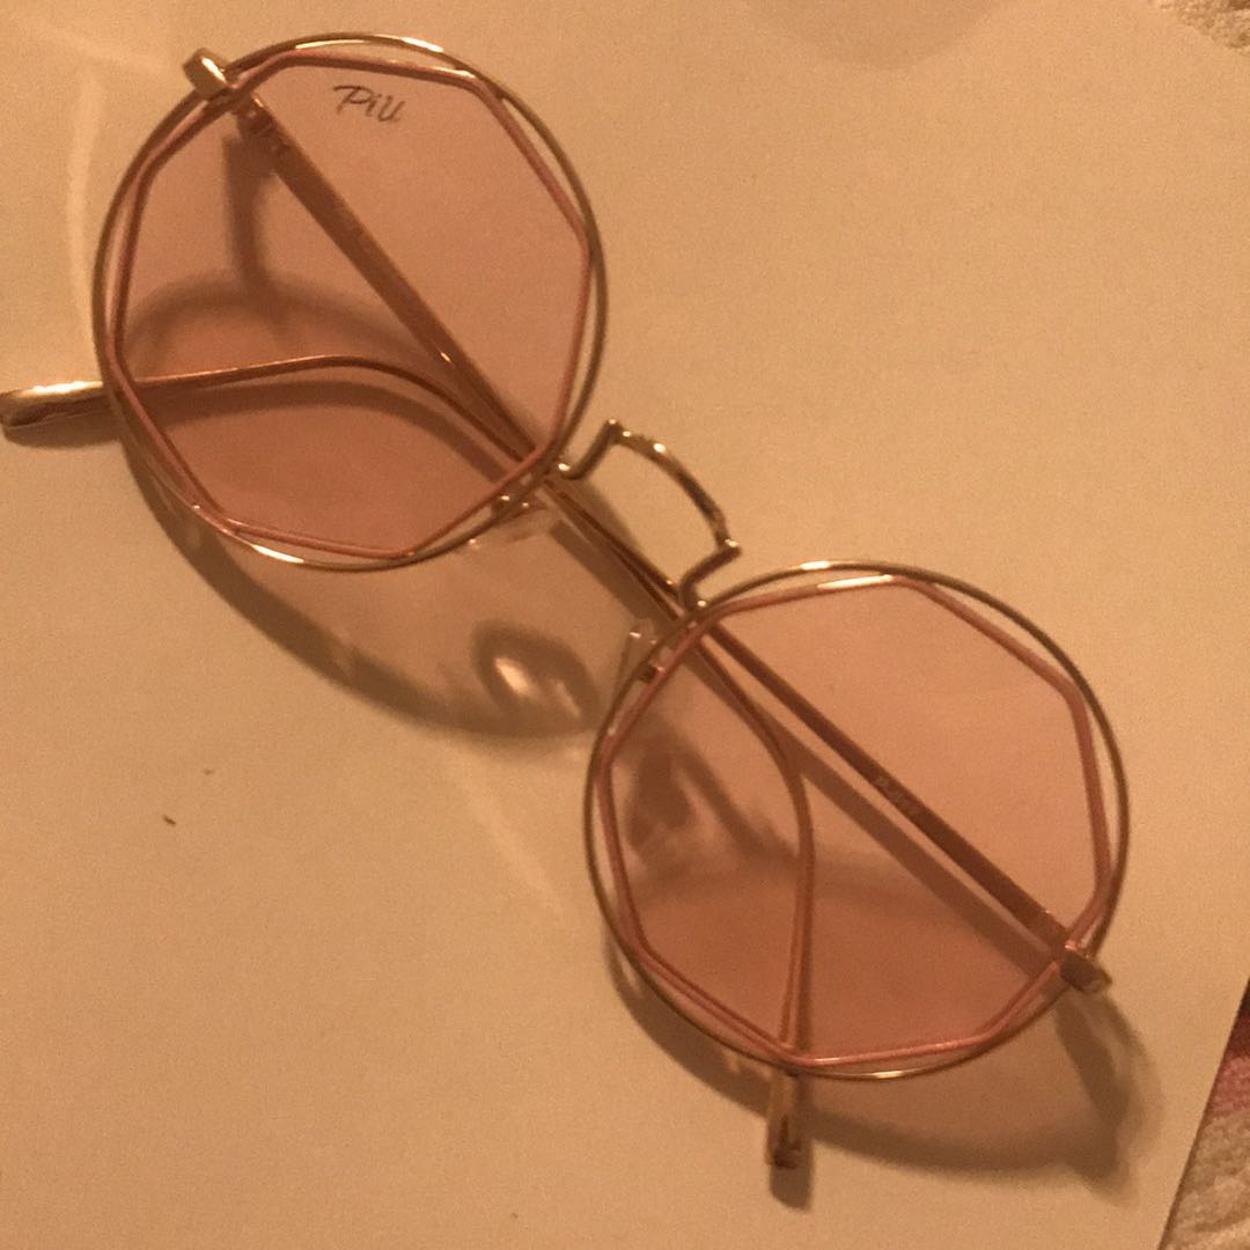 Donna Piu Gözlük